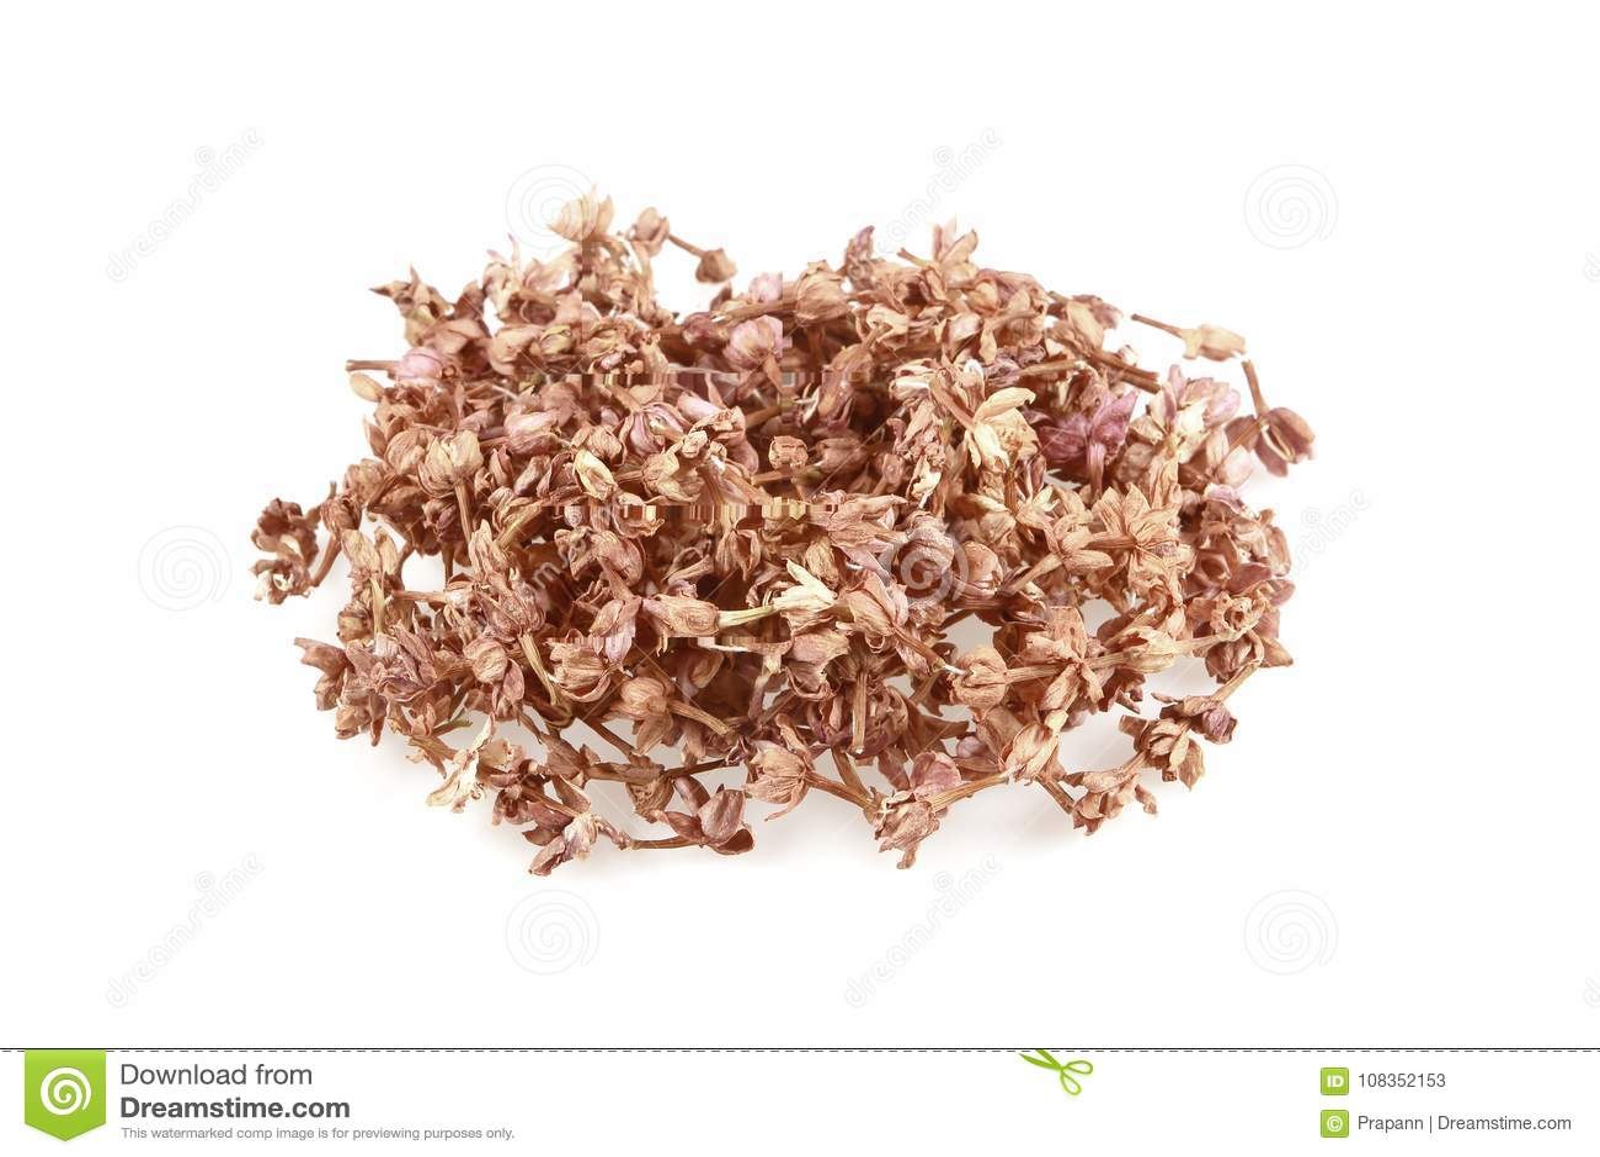 Dried Jasmine Flower On White Background Stock Image Image Of Pile